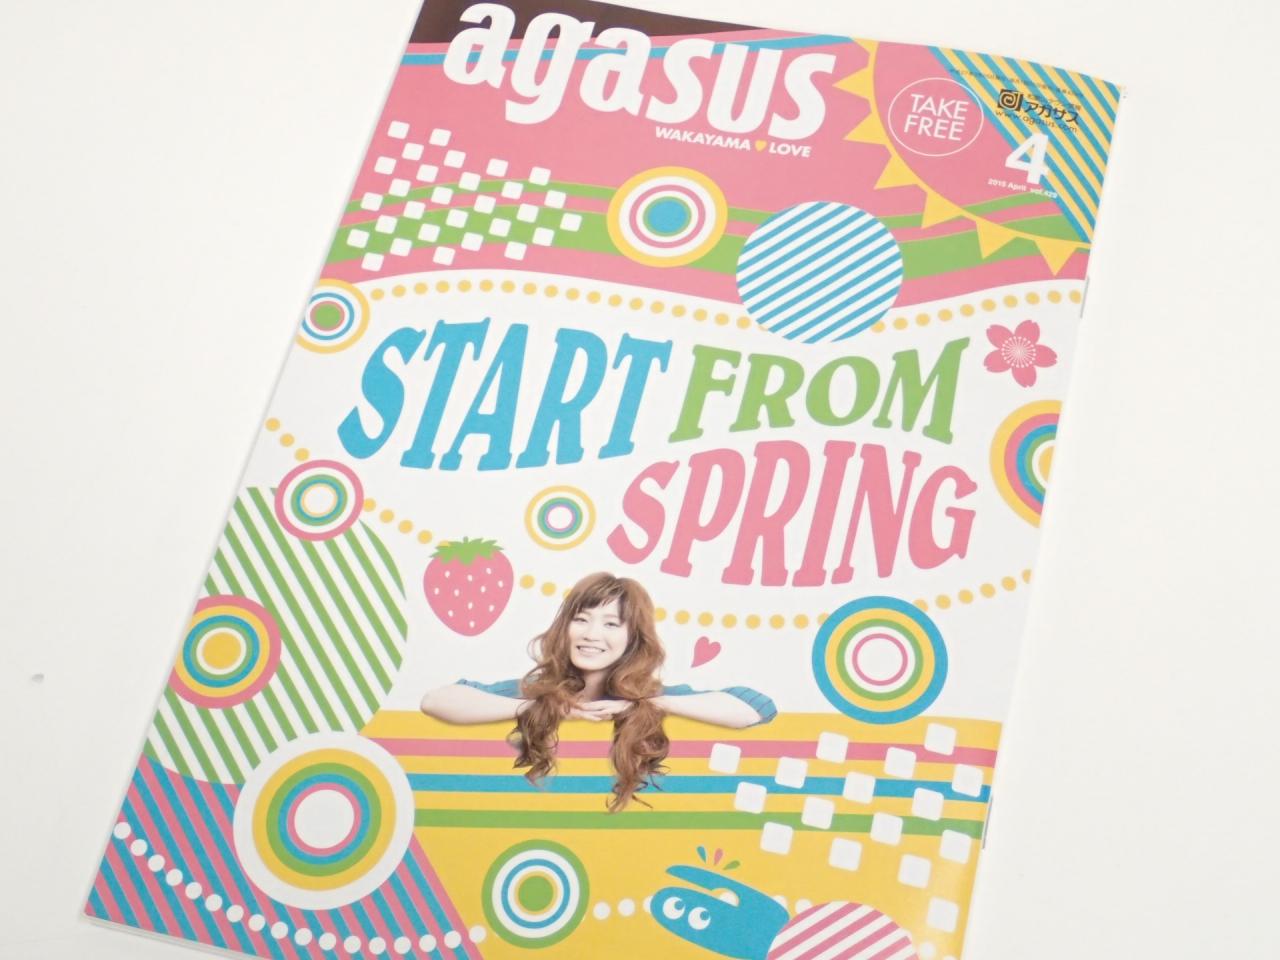 agasus(アガサス)届きました♪